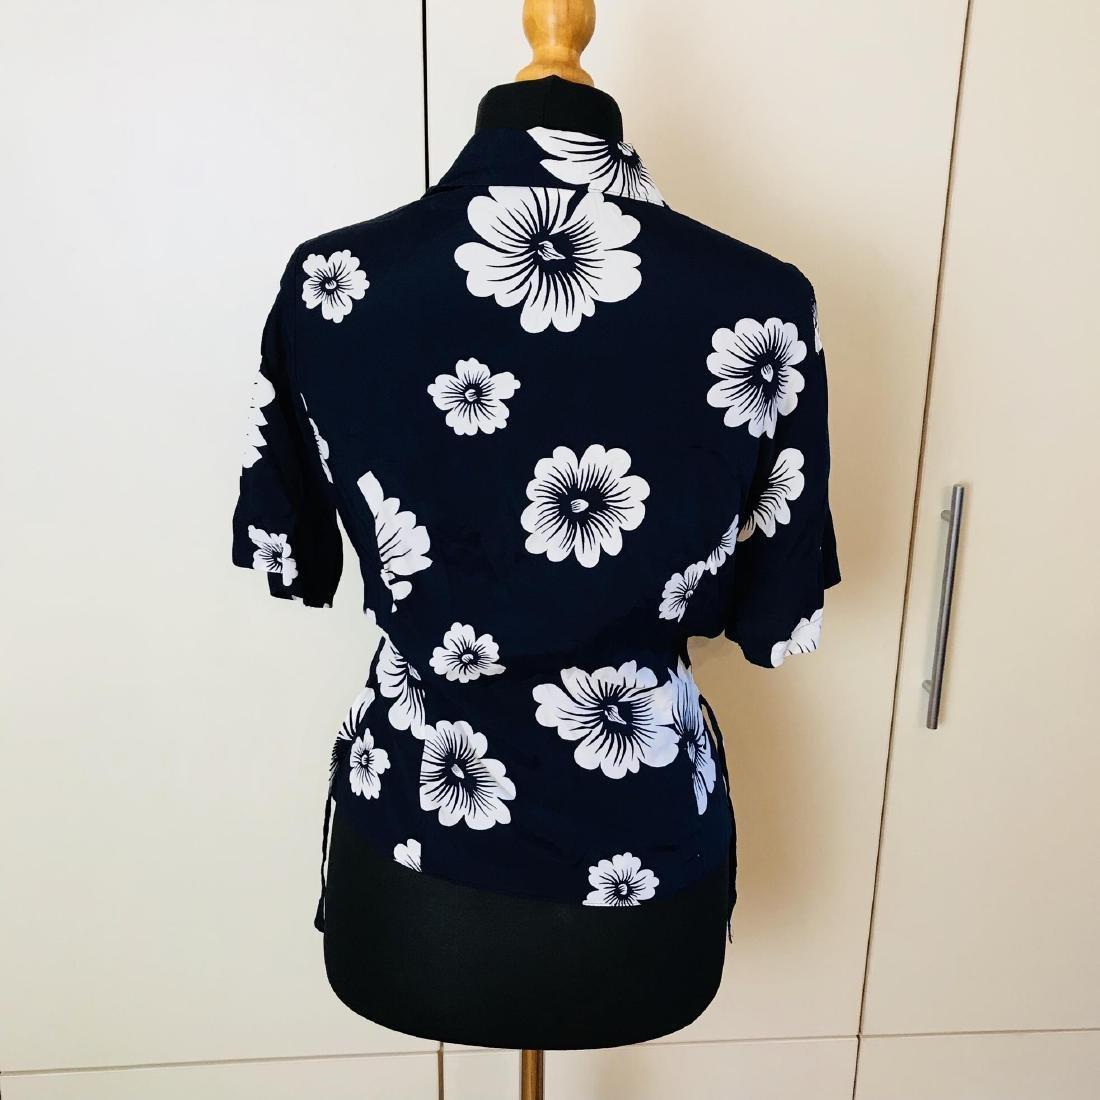 Vintage Women's Navy Blue Blouse Shirt Top - 4